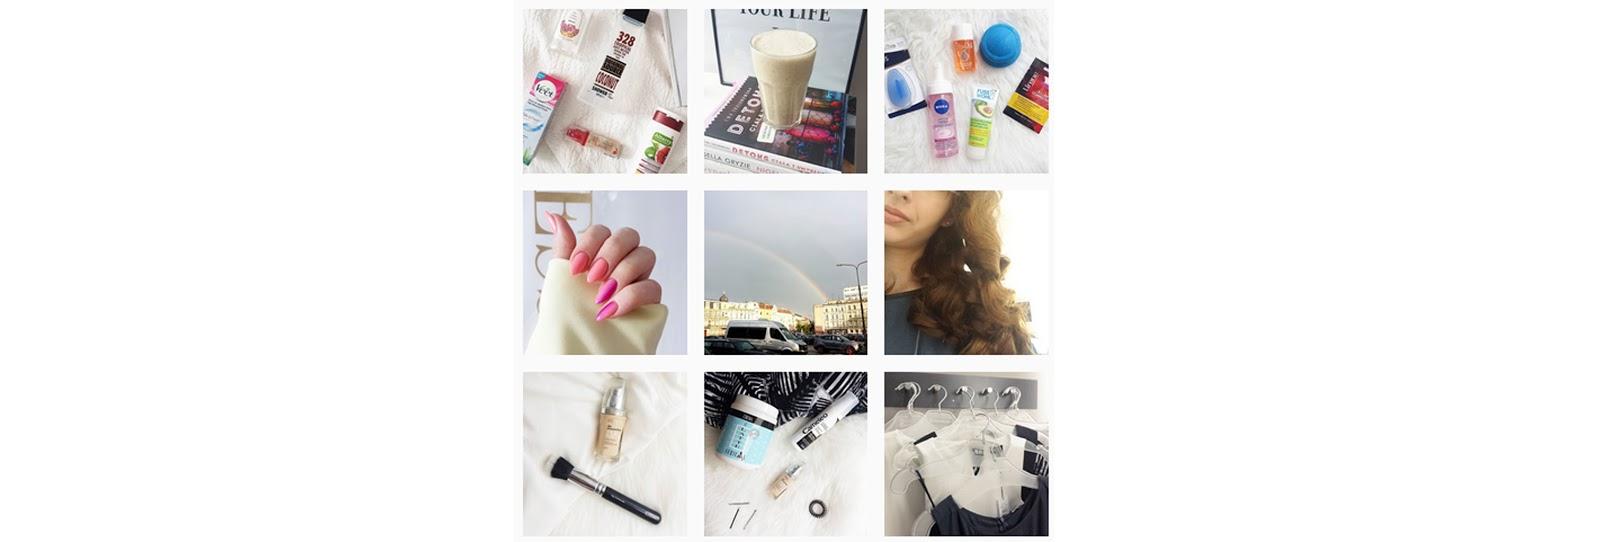 https://www.instagram.com/marie_velte/